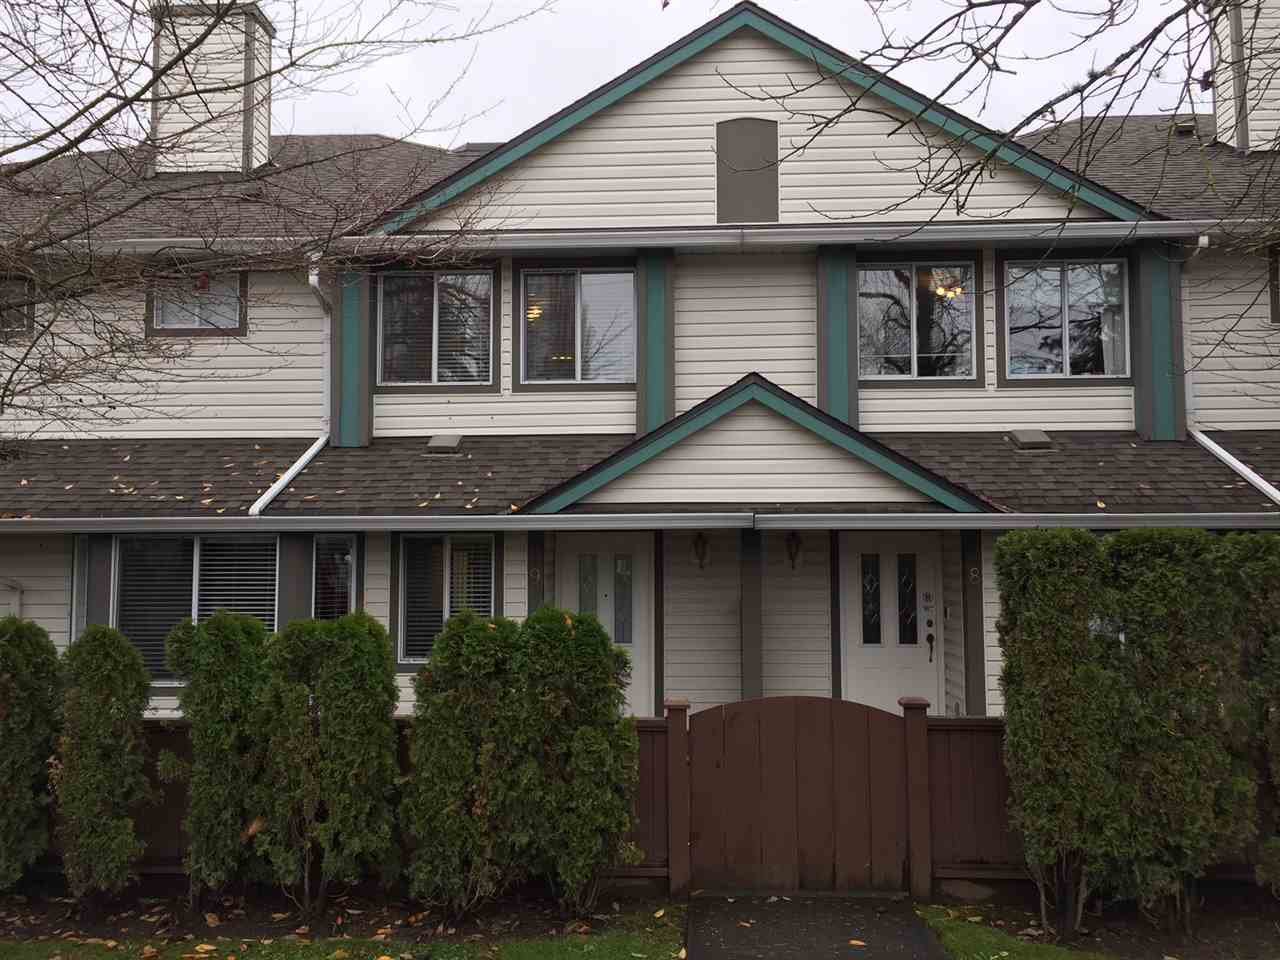 Main Photo: 29 11950 232 Street in Maple Ridge: Cottonwood MR Townhouse for sale : MLS®# R2224824